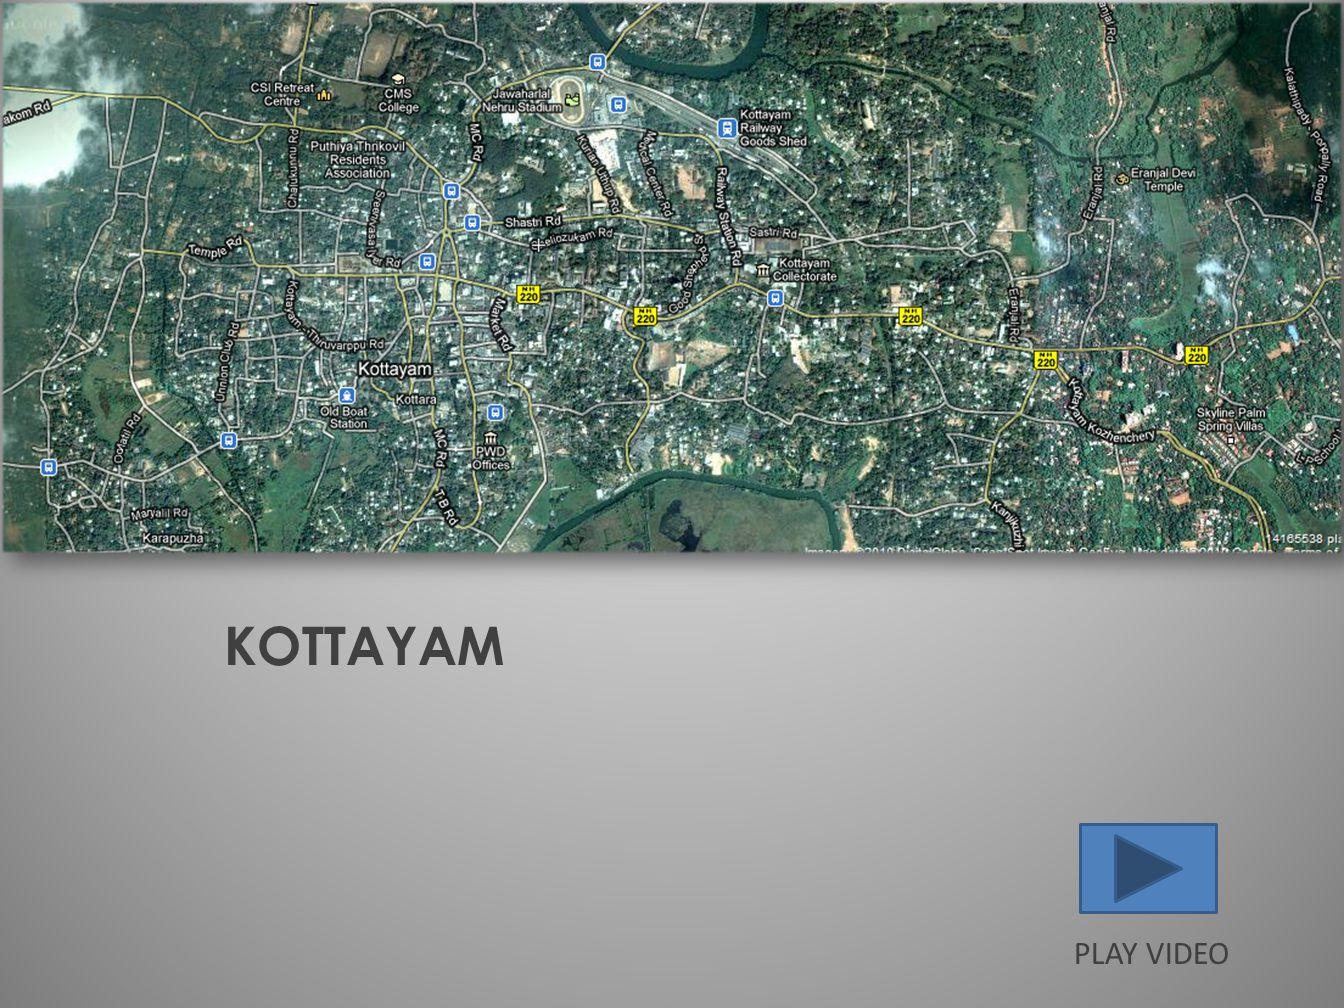 KOTTAYAM PLAY VIDEO